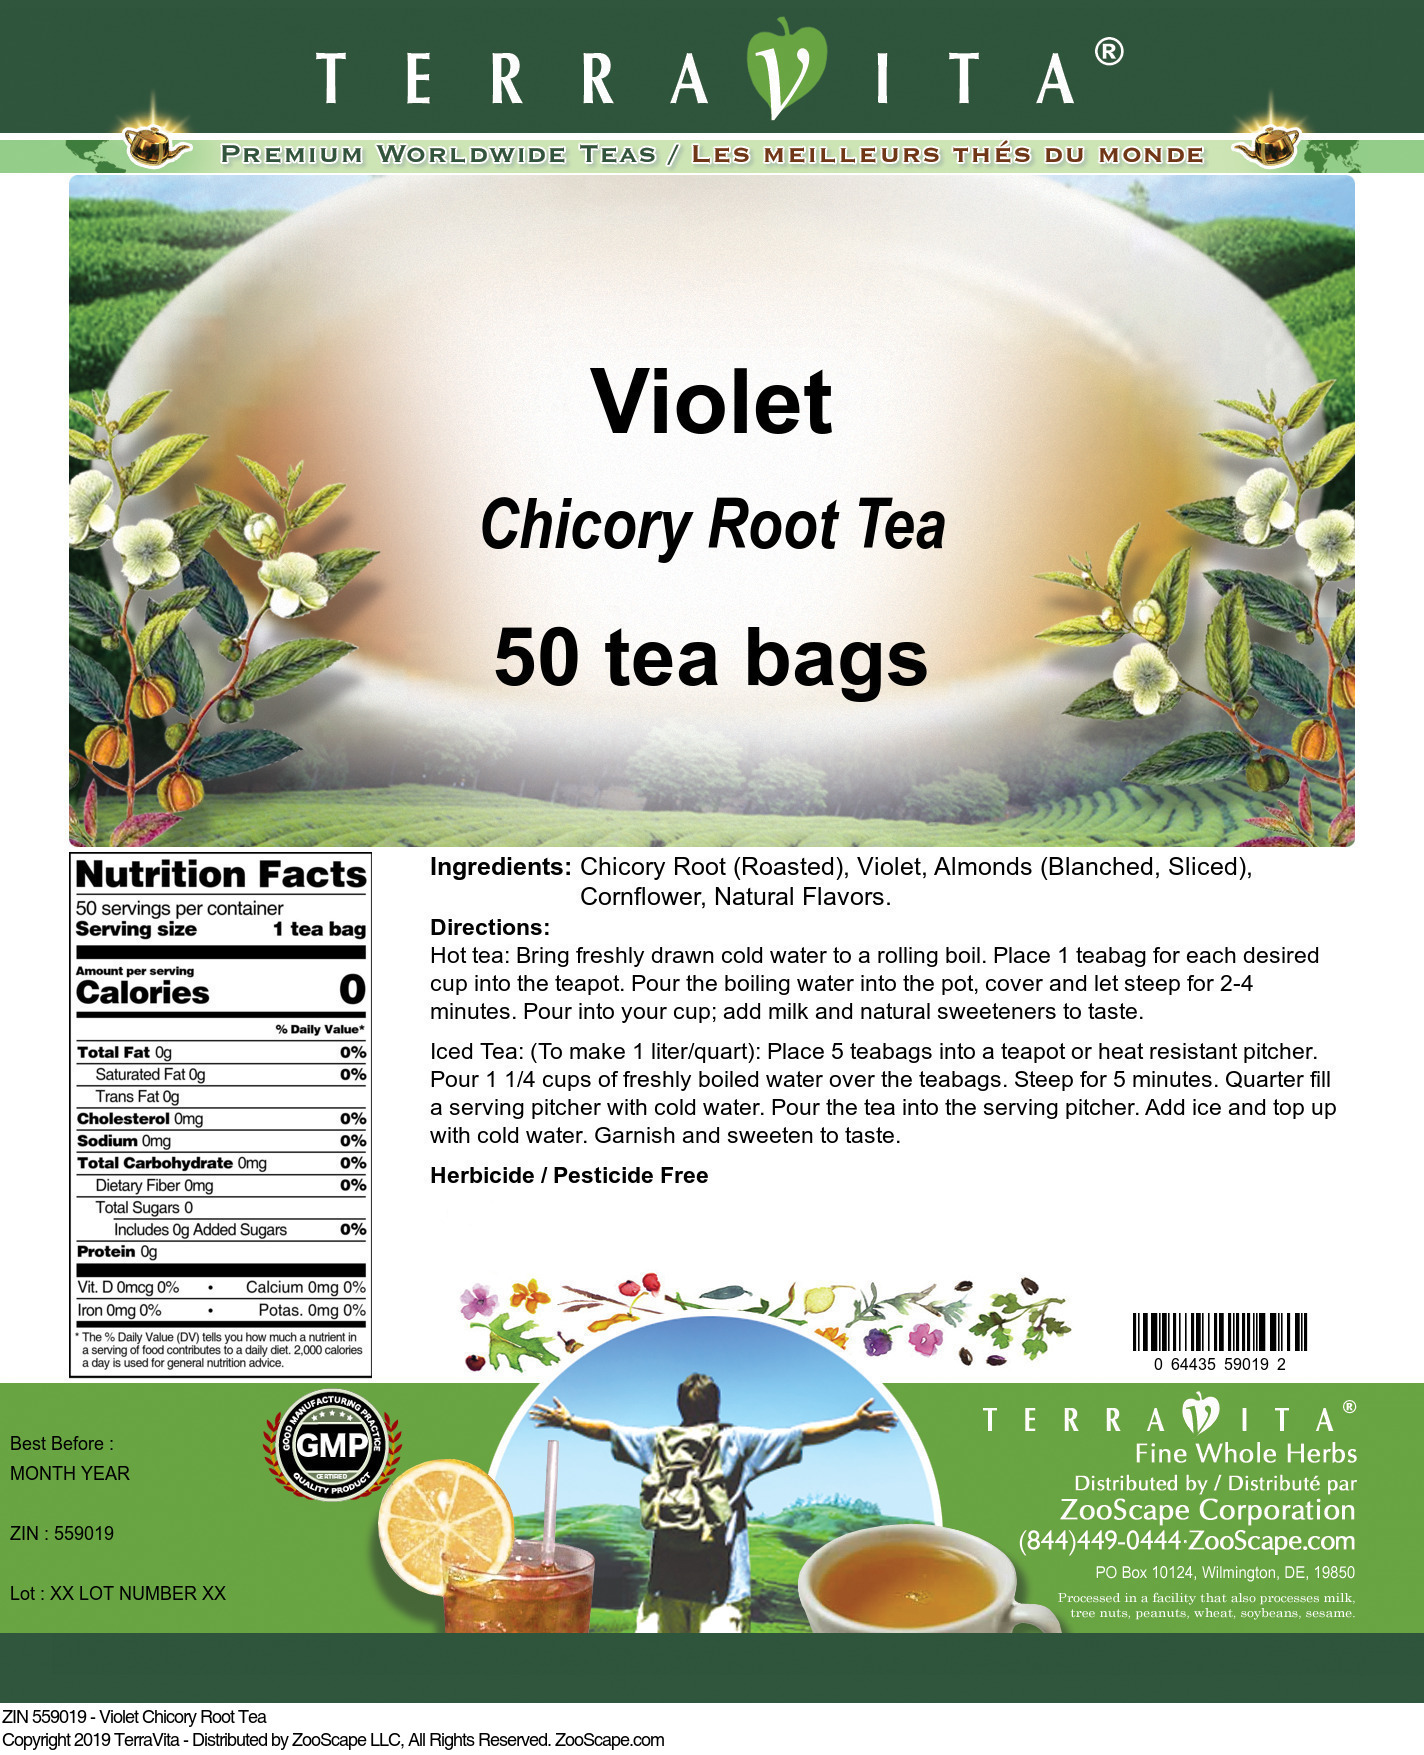 Violet Chicory Root Tea